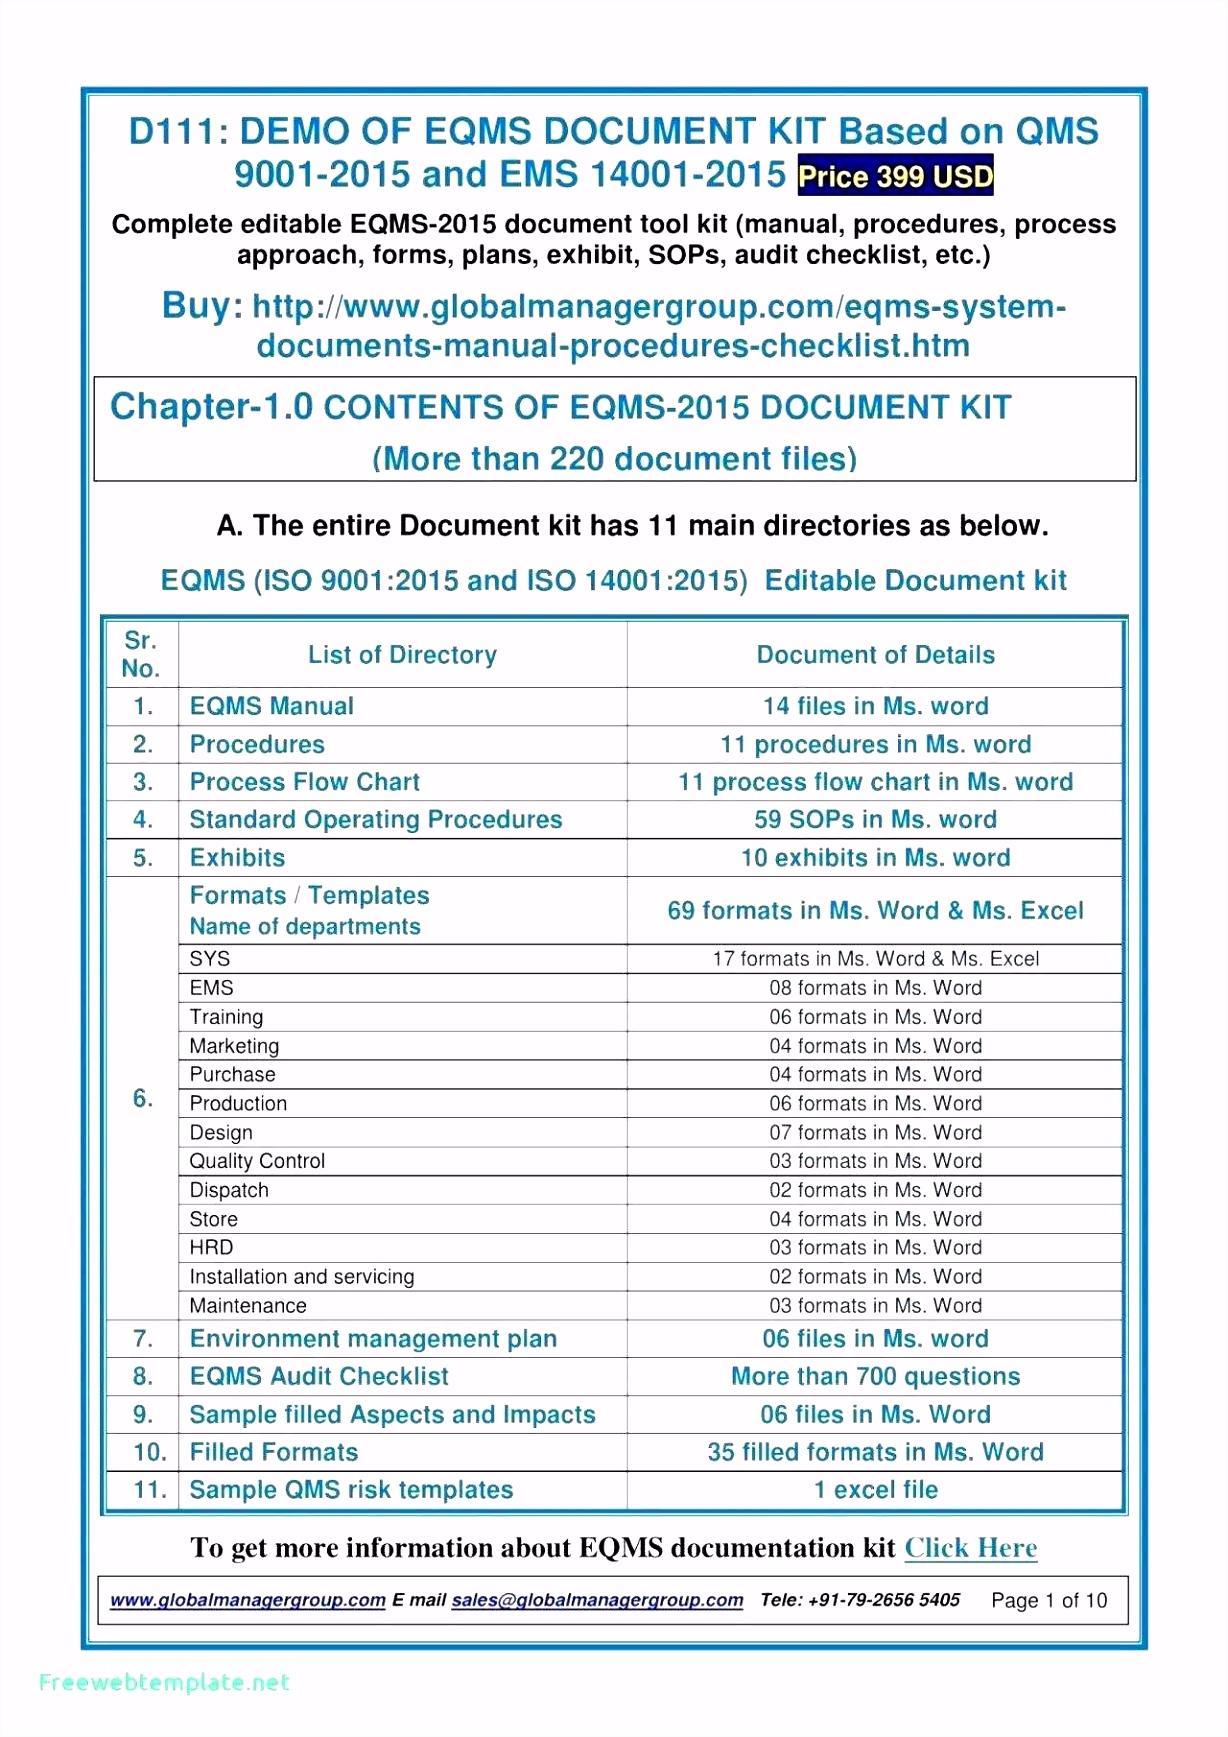 Iso 14001 Handbuch Vorlage iso 9001 2015 Checklist Excel Template Glendale Munity Document G8pt23gau6 Emuw62dsfh